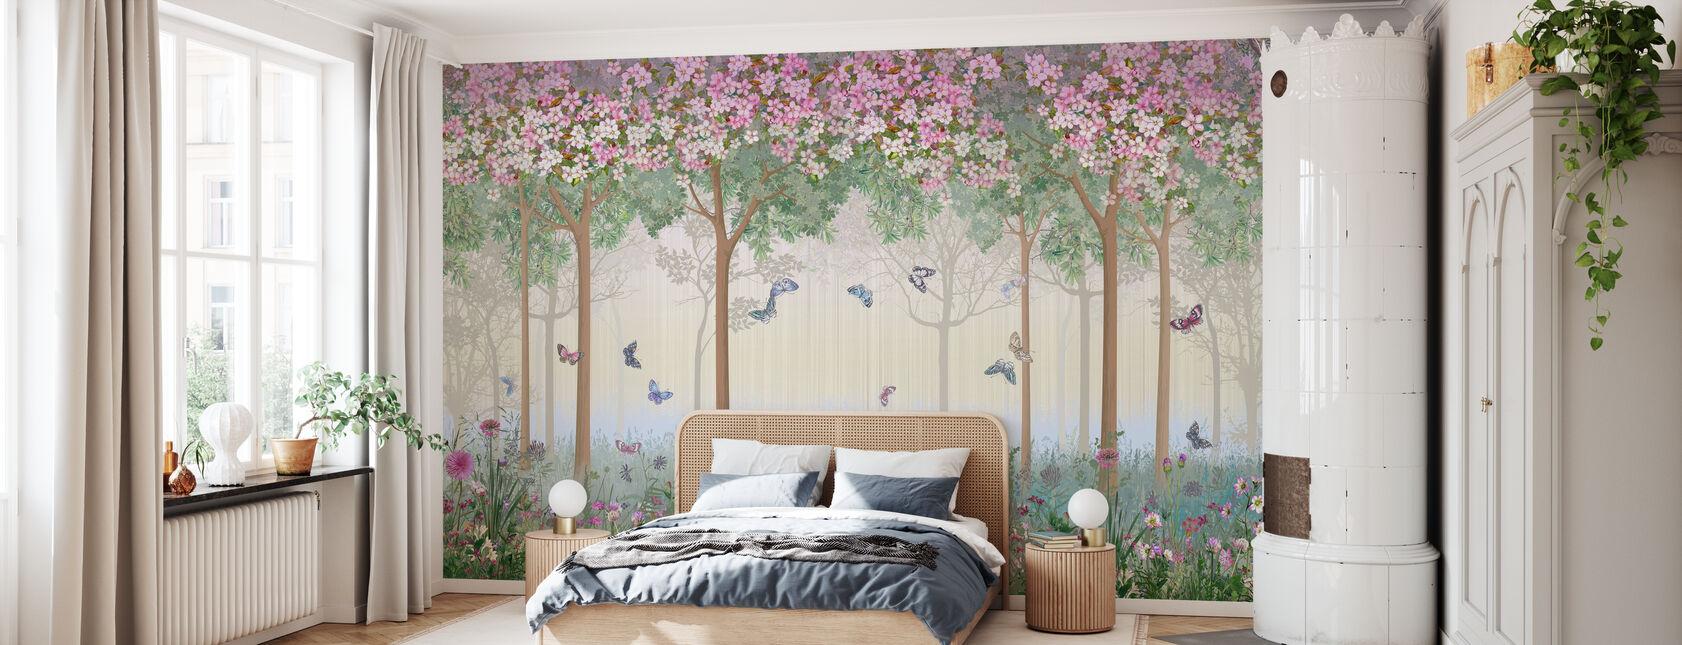 Butterflies in Hazy Meadow - Wallpaper - Bedroom